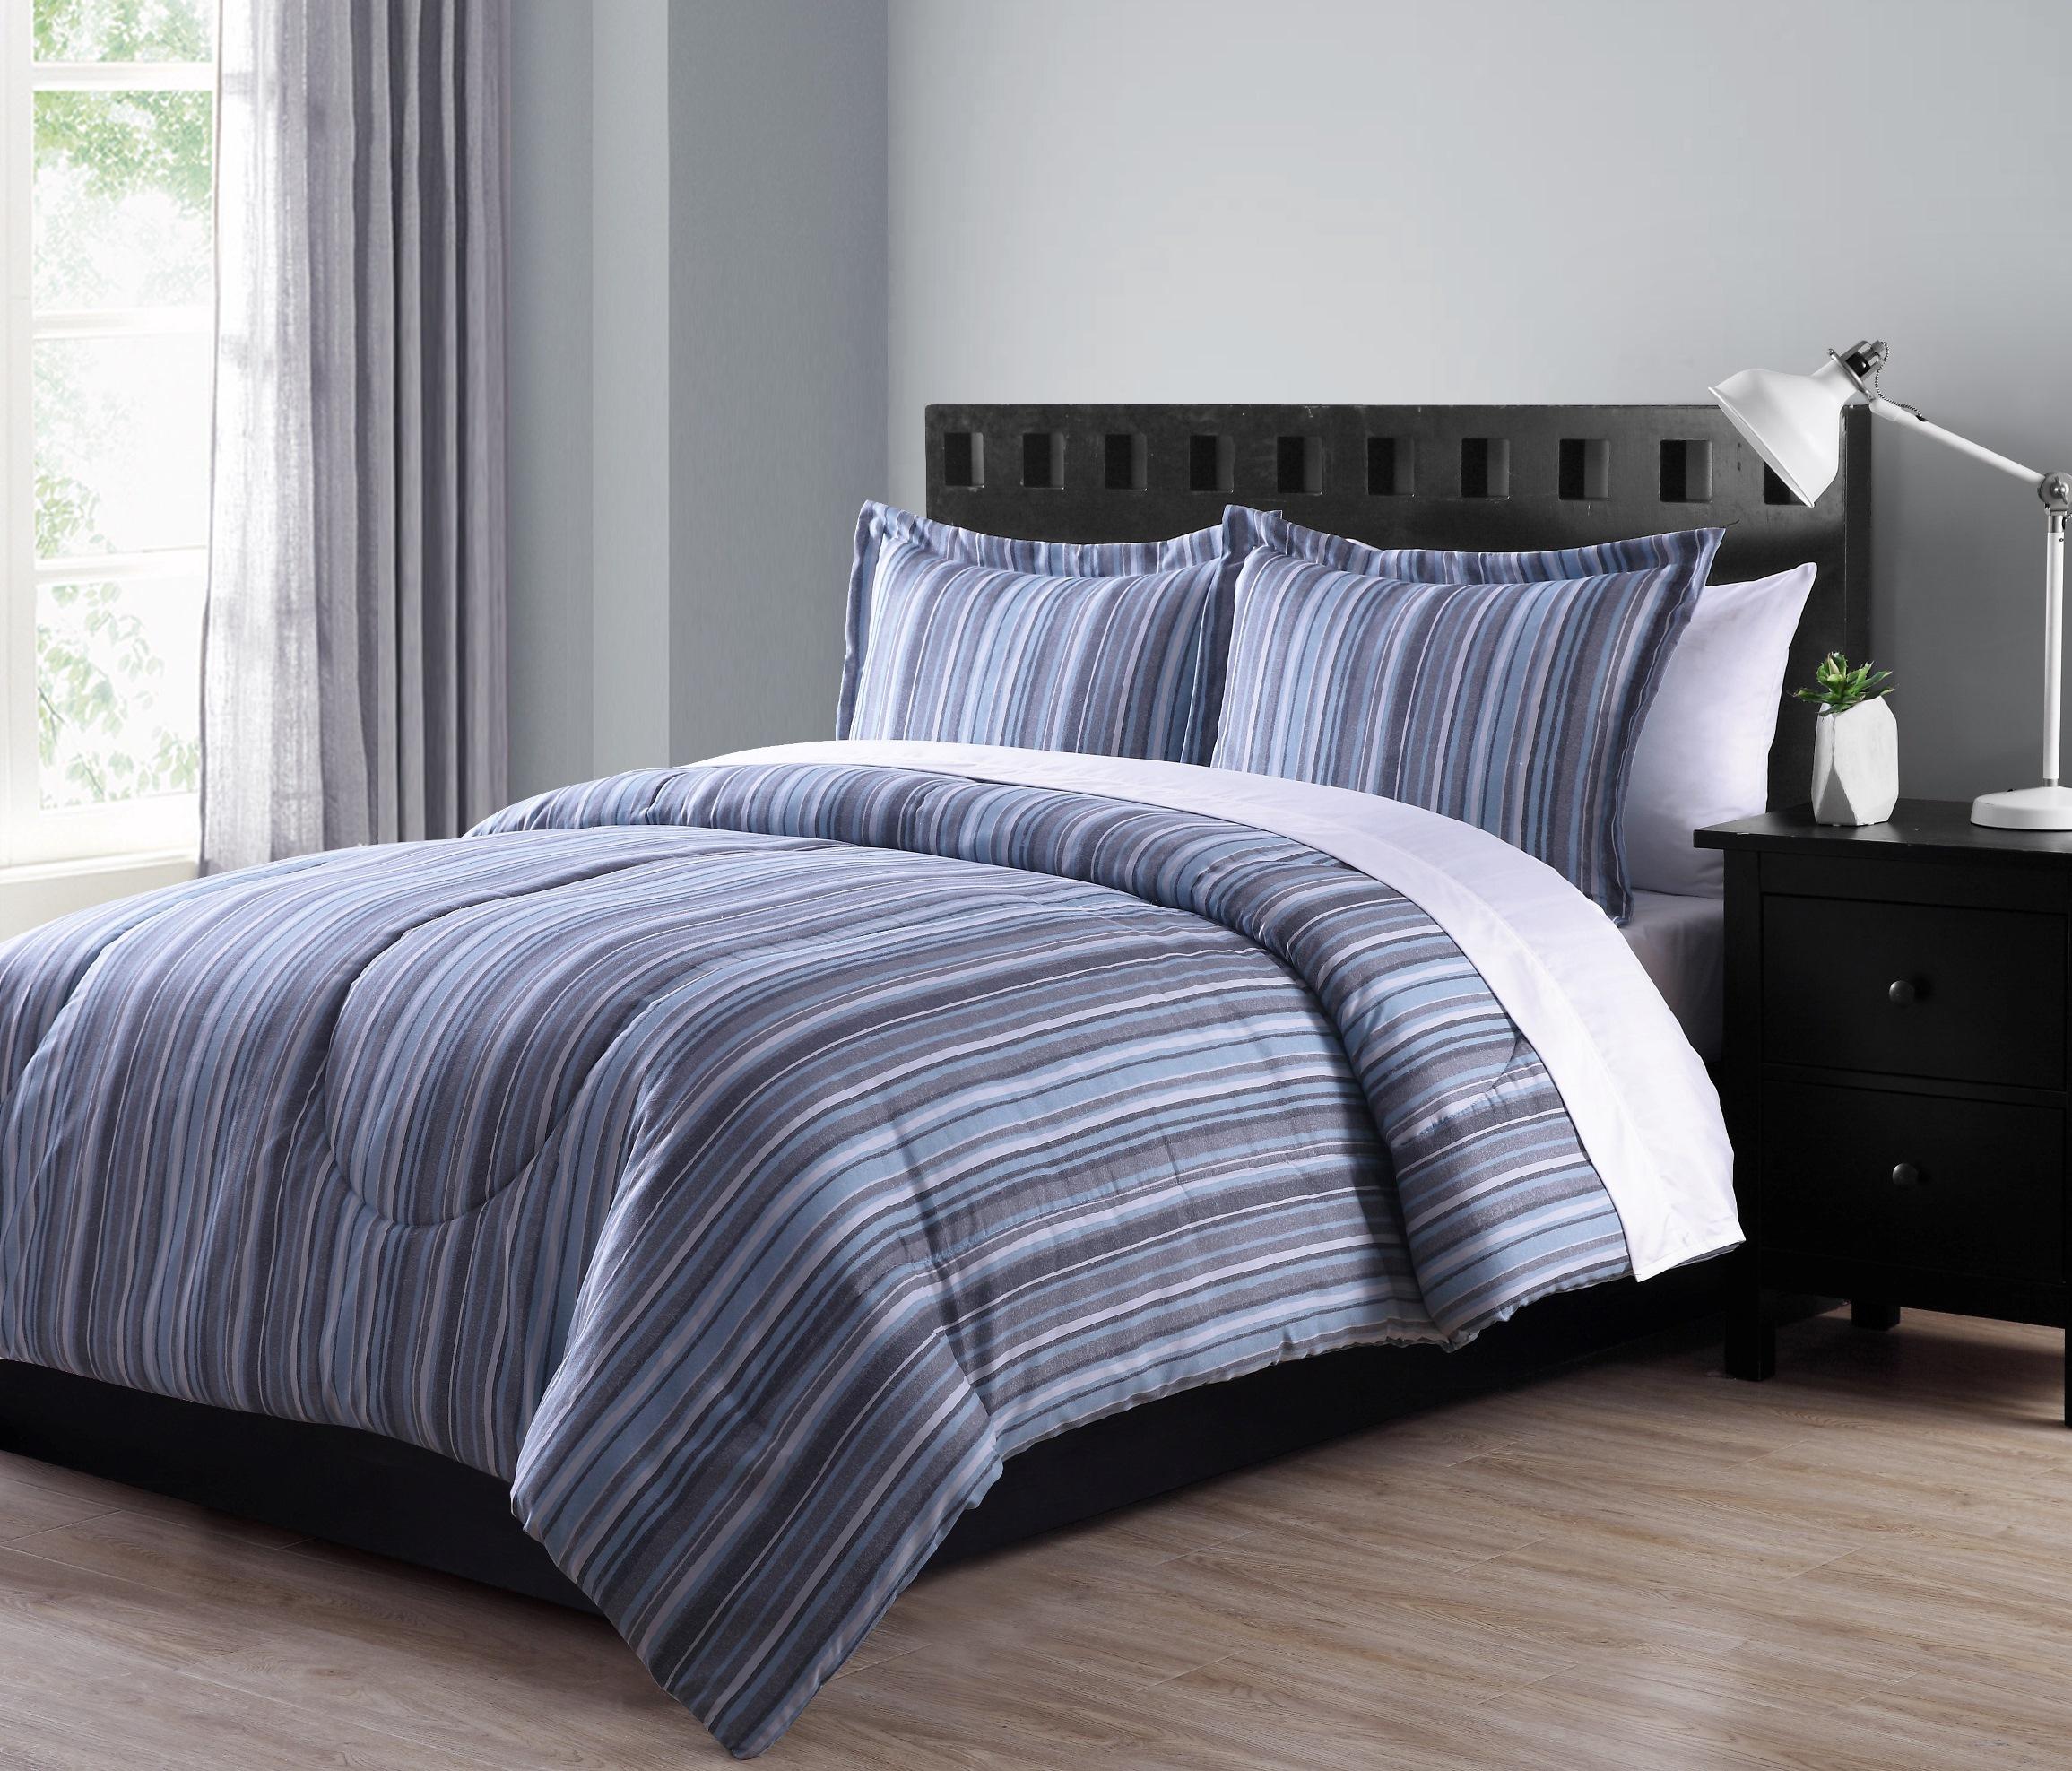 Colormate Mini Comforter Set – Textured Stripe